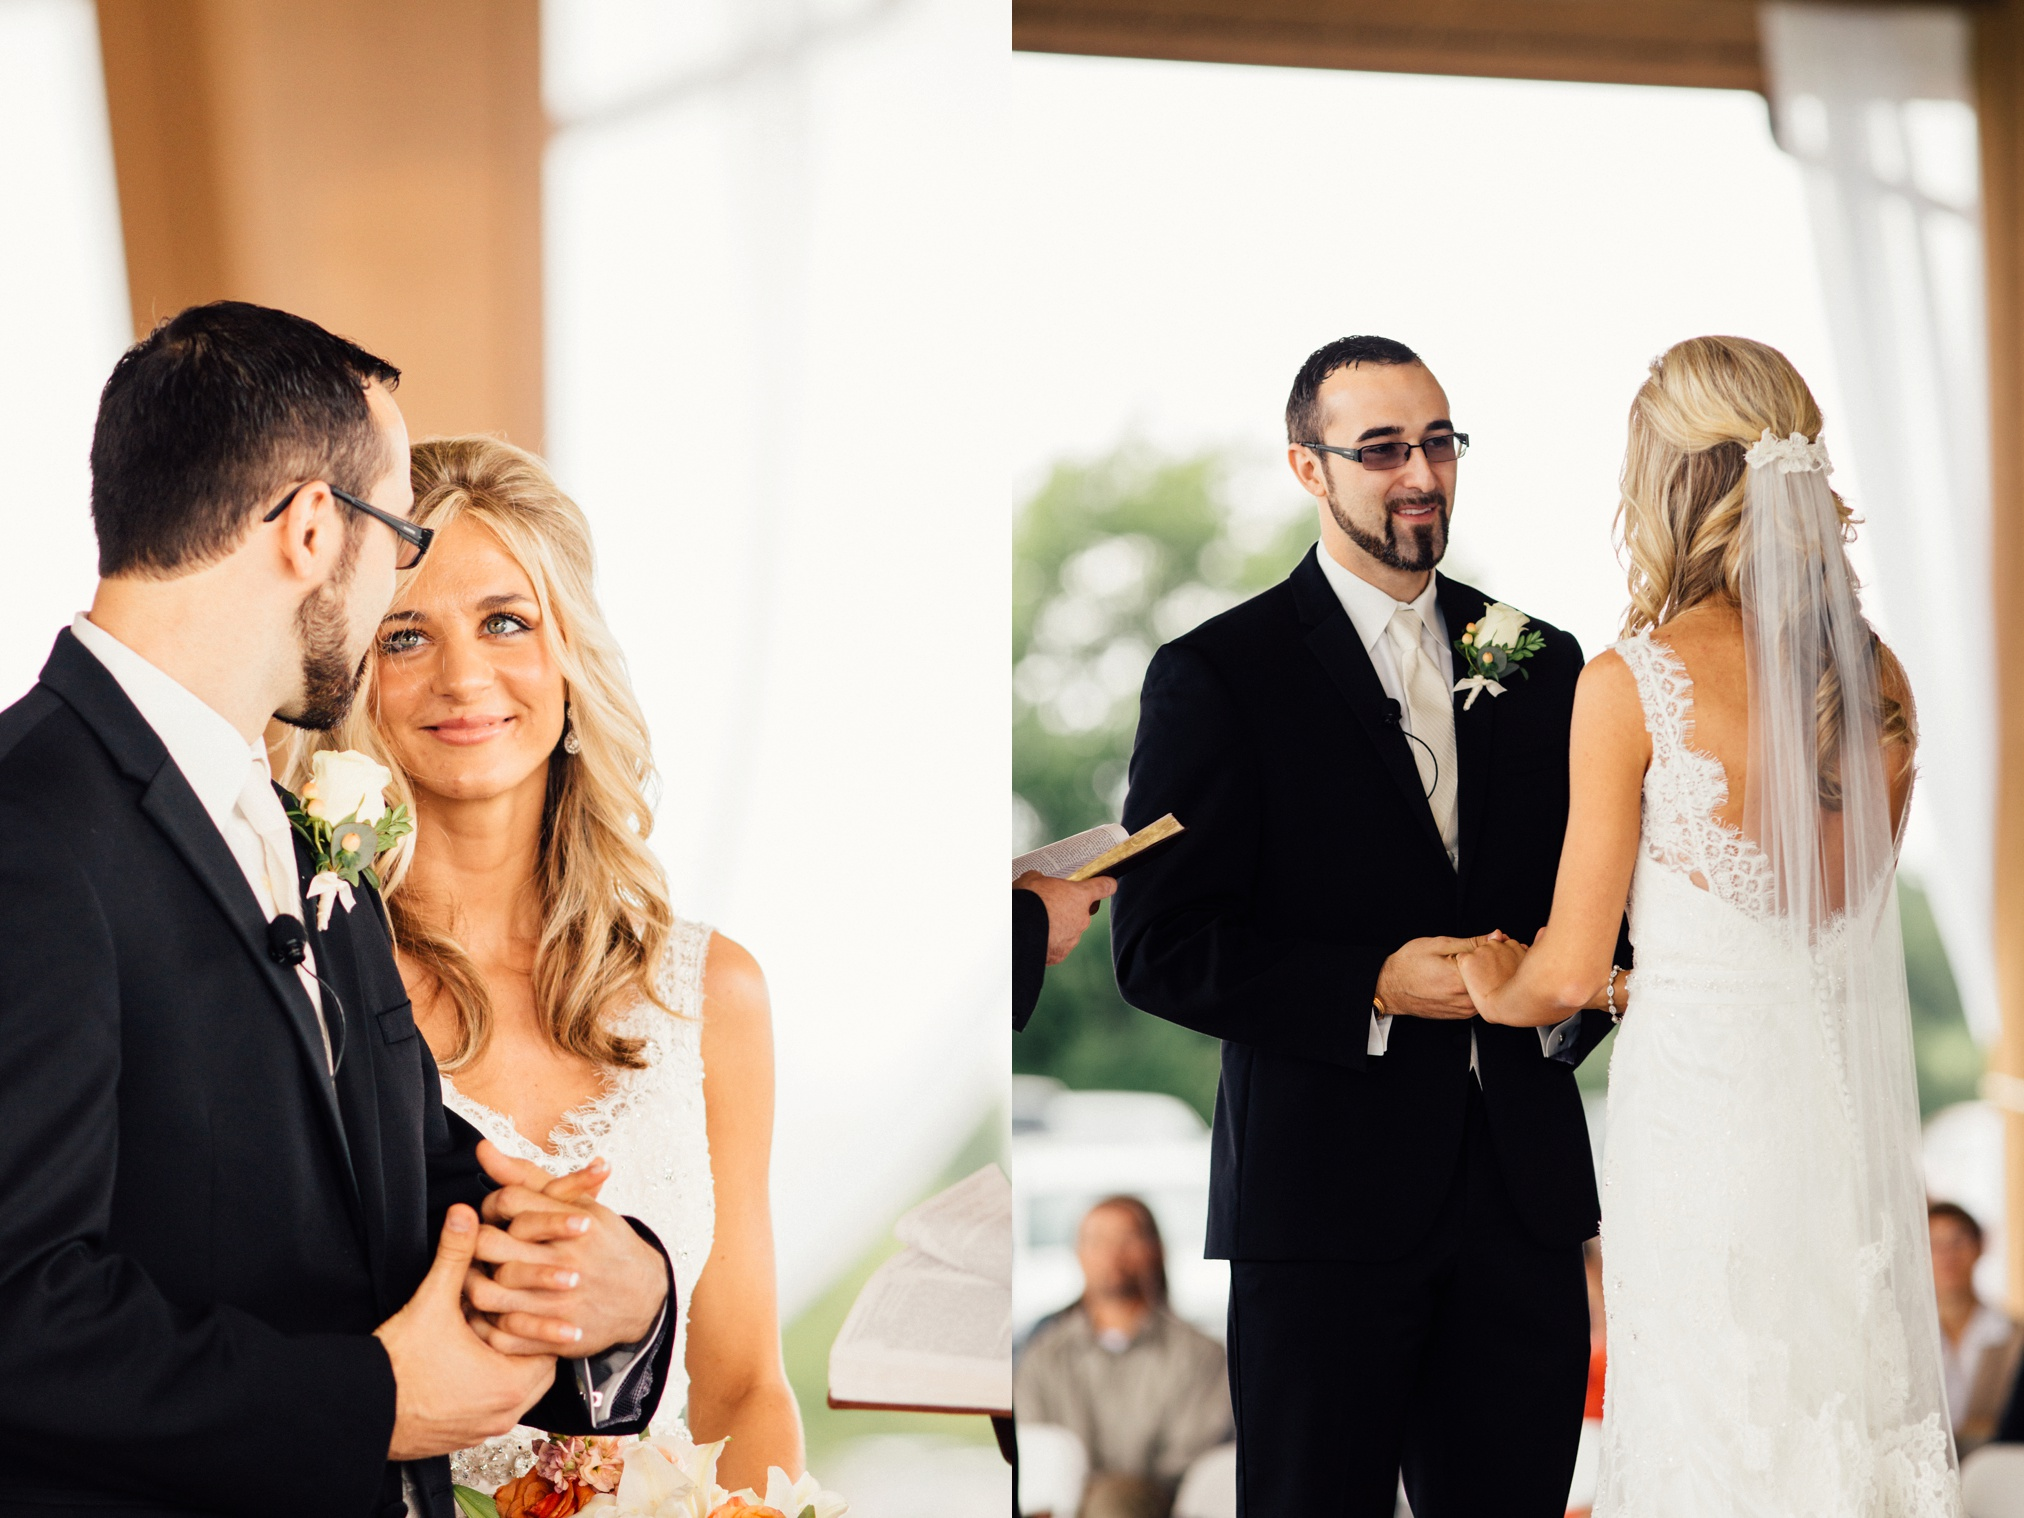 schmid_wedding-487.jpg